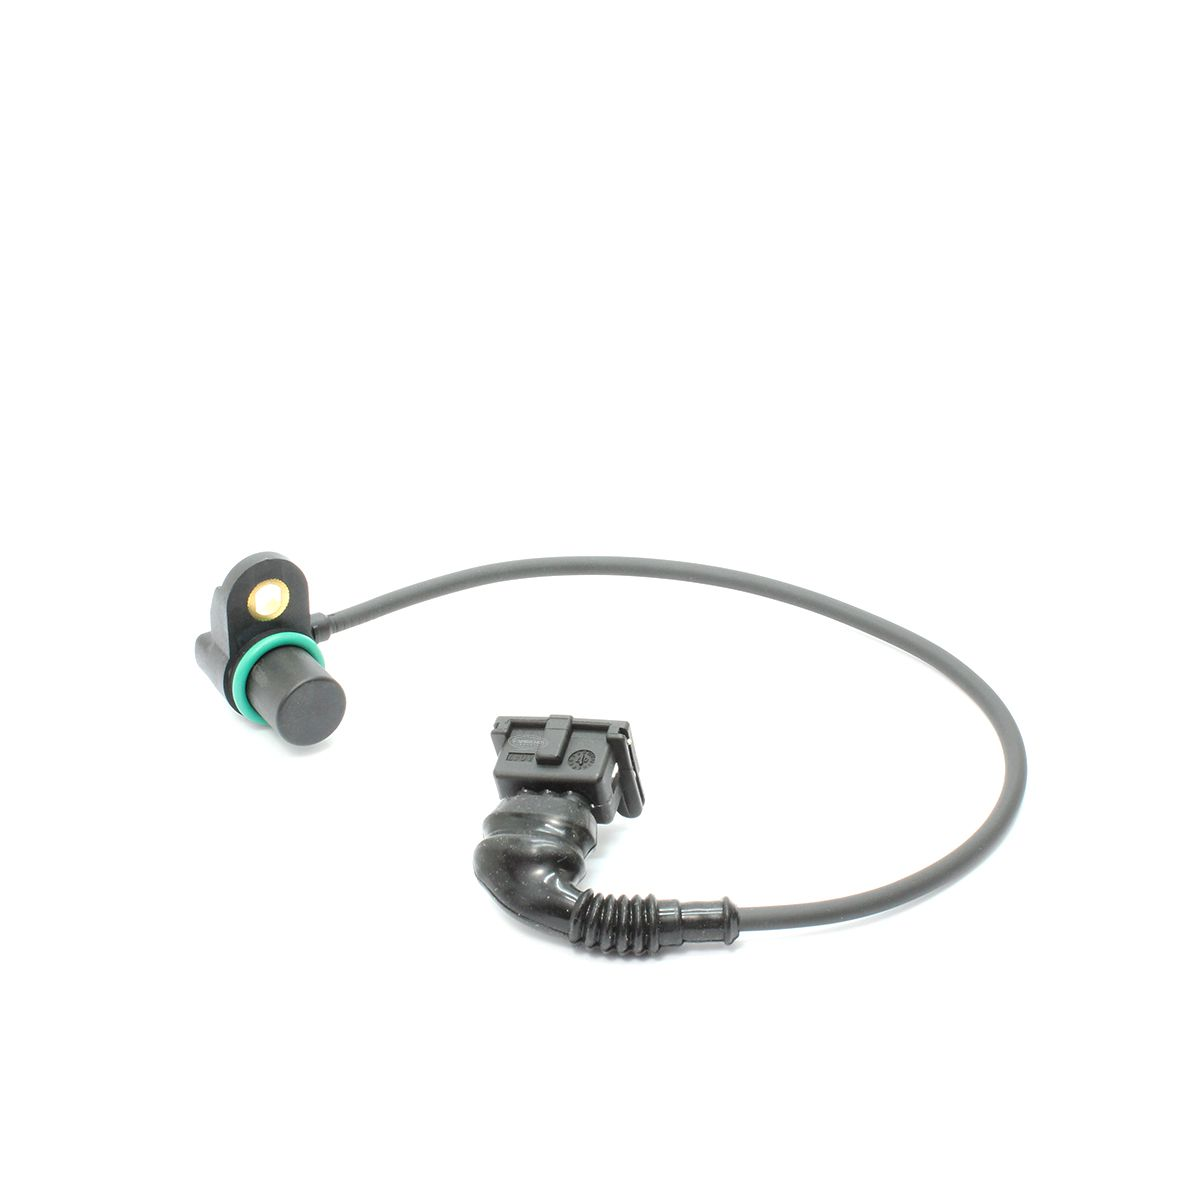 Sensor de Fase Comando Bmw 535i / 540i / 740i / 740il / 840ci - 12141742185